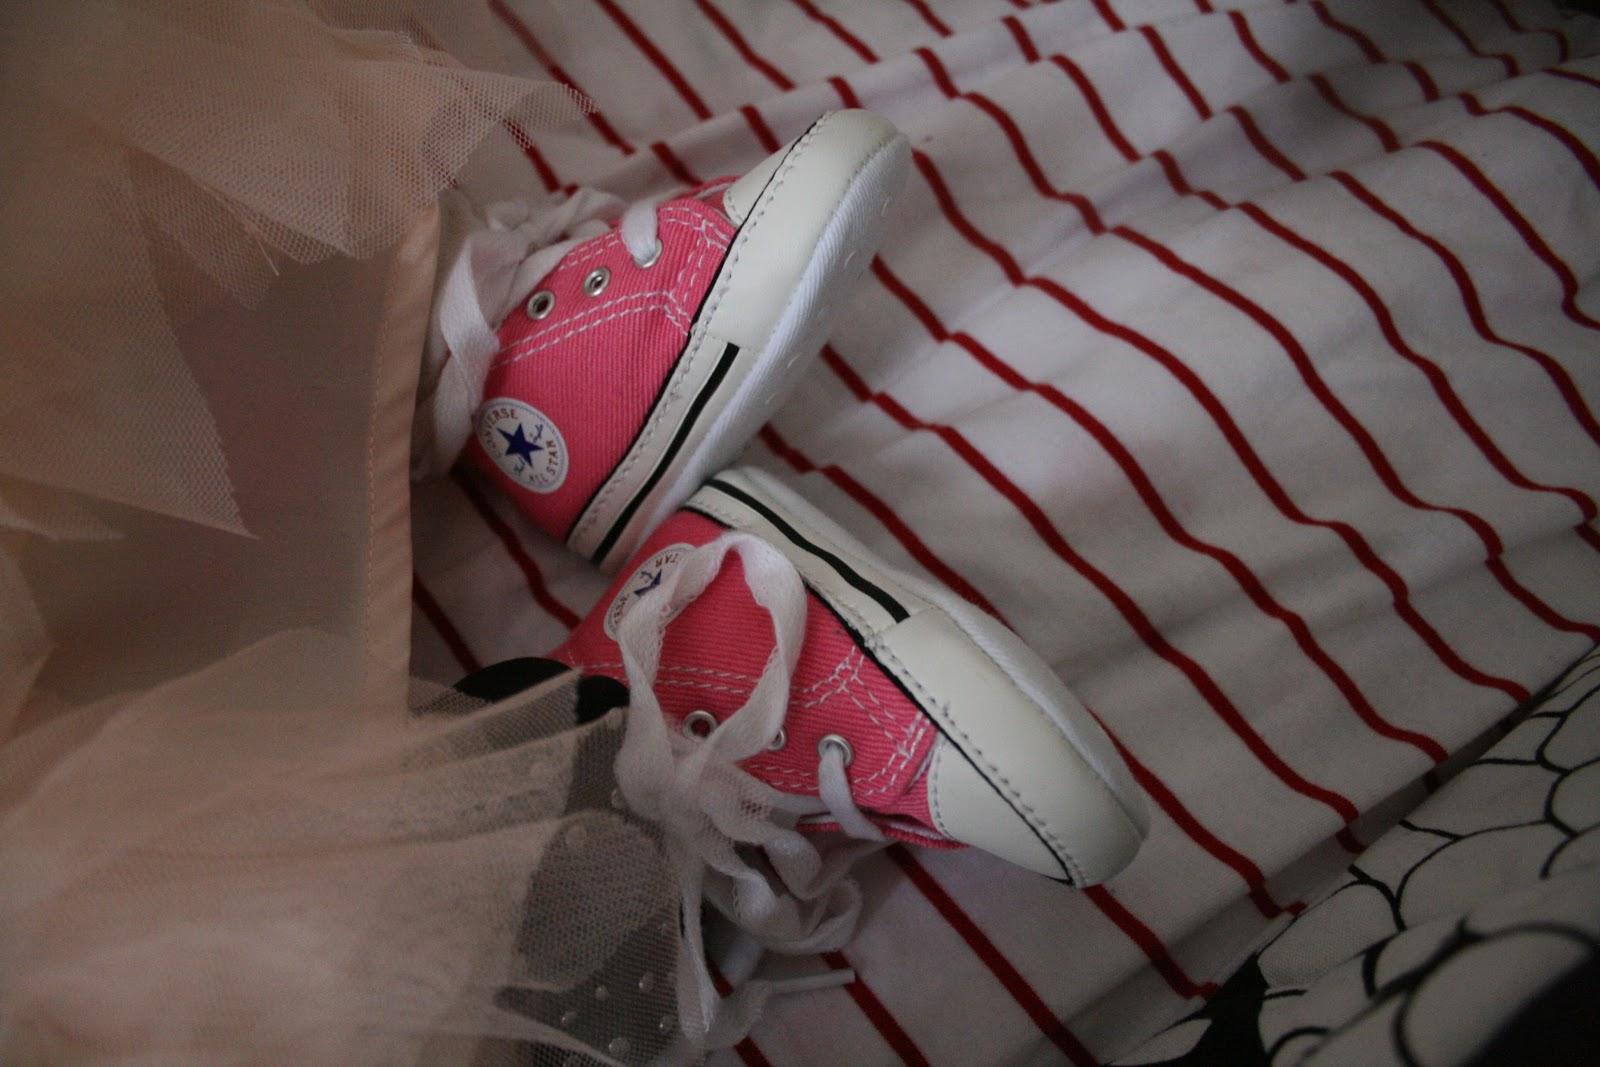 Minimen ensimmäiset kengät olivat vaaleanpunaiset Converse-tennarit.  Ensiaskelia niillä ei otettu 5ecaf72523